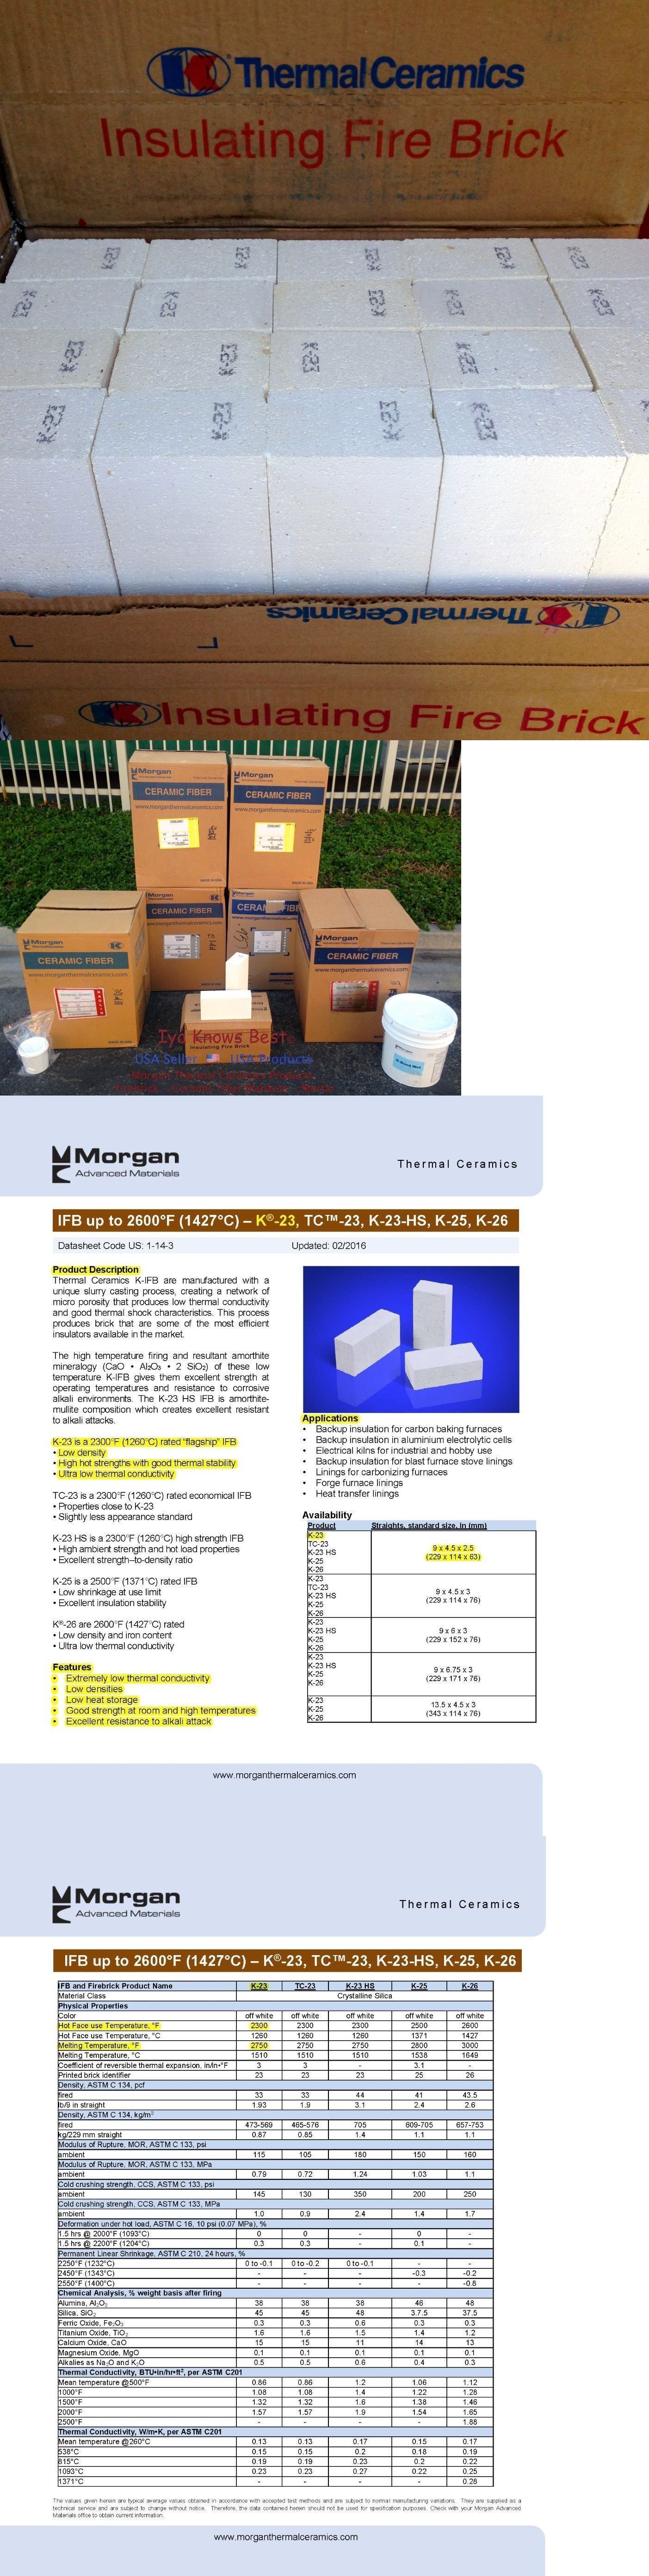 K23 Insulating Firebricks 9 X 4 5 X 2 5 Morgan Thermal Ceramics 2300f Box Of 3 Firebrick Ceramics Brick